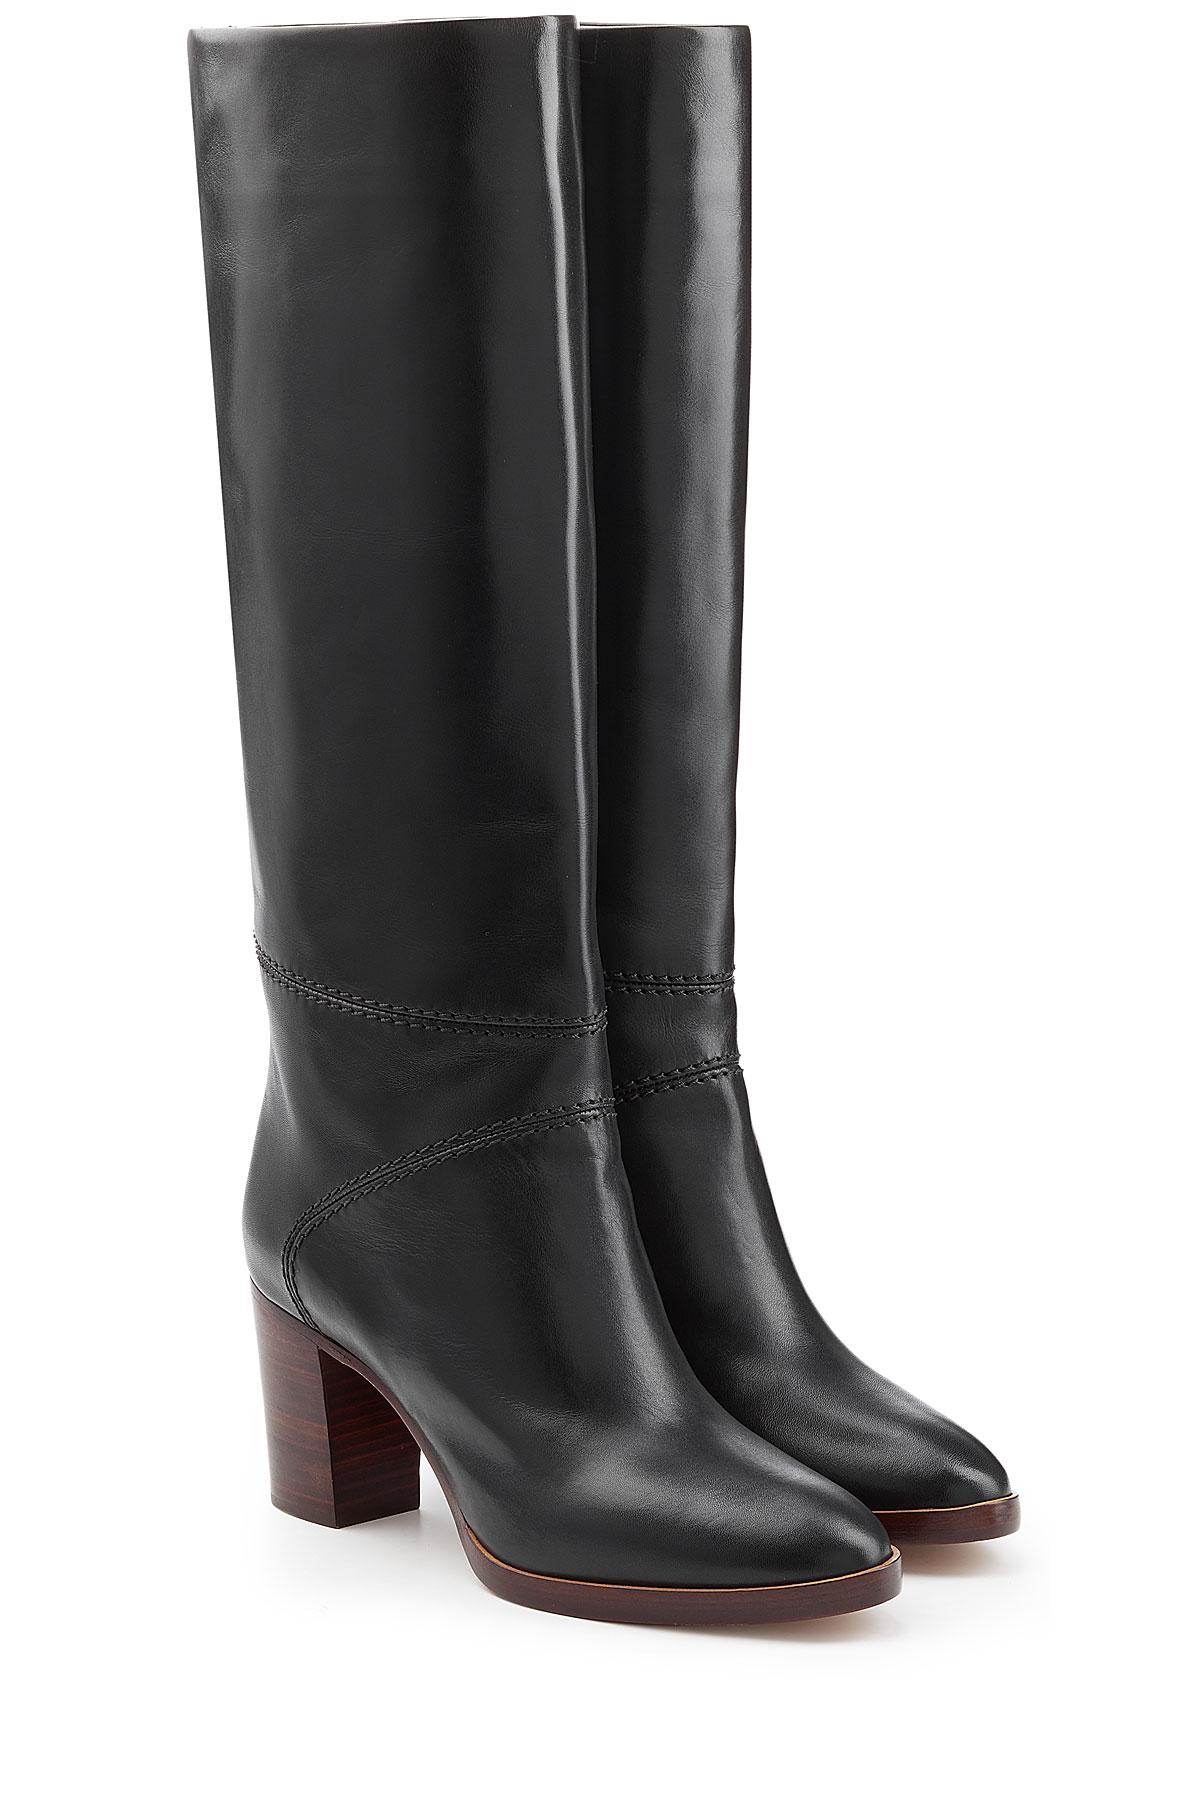 chlo chlo leather knee boots black in black lyst. Black Bedroom Furniture Sets. Home Design Ideas